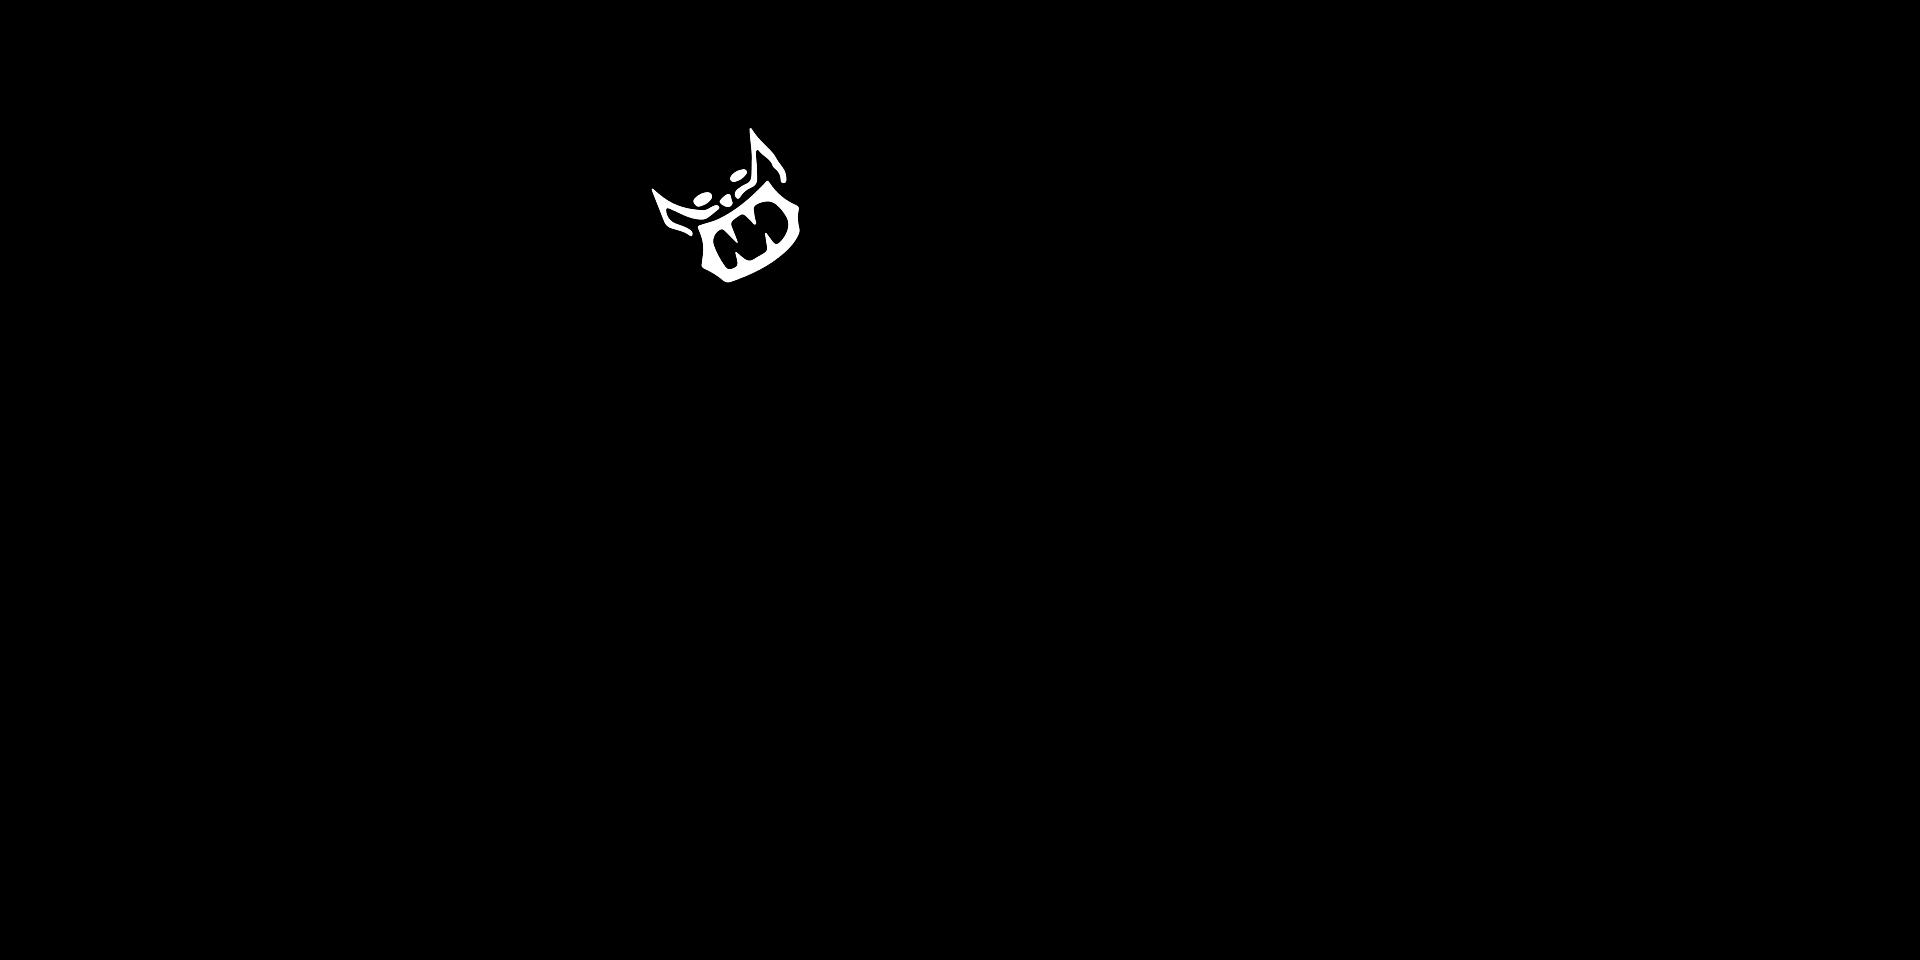 Clipart bat upside down. Vampire template free printable